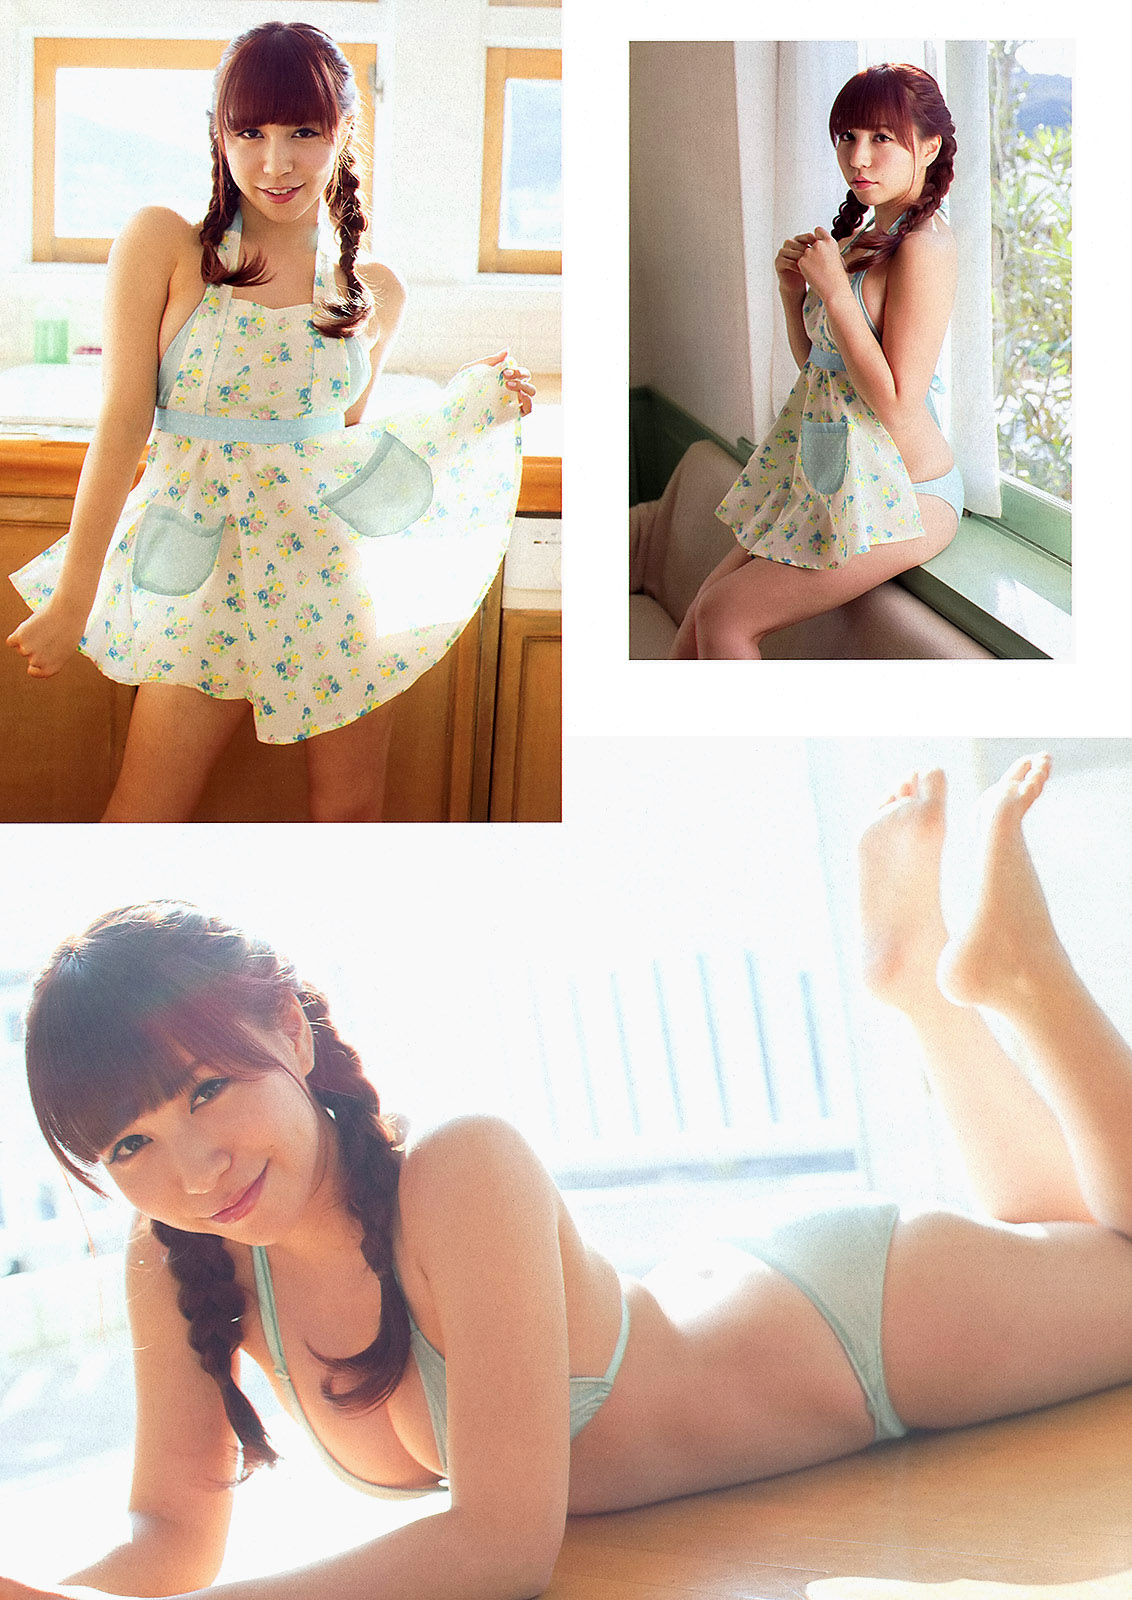 Kasai Tomomi WPB 130204 02.jpg